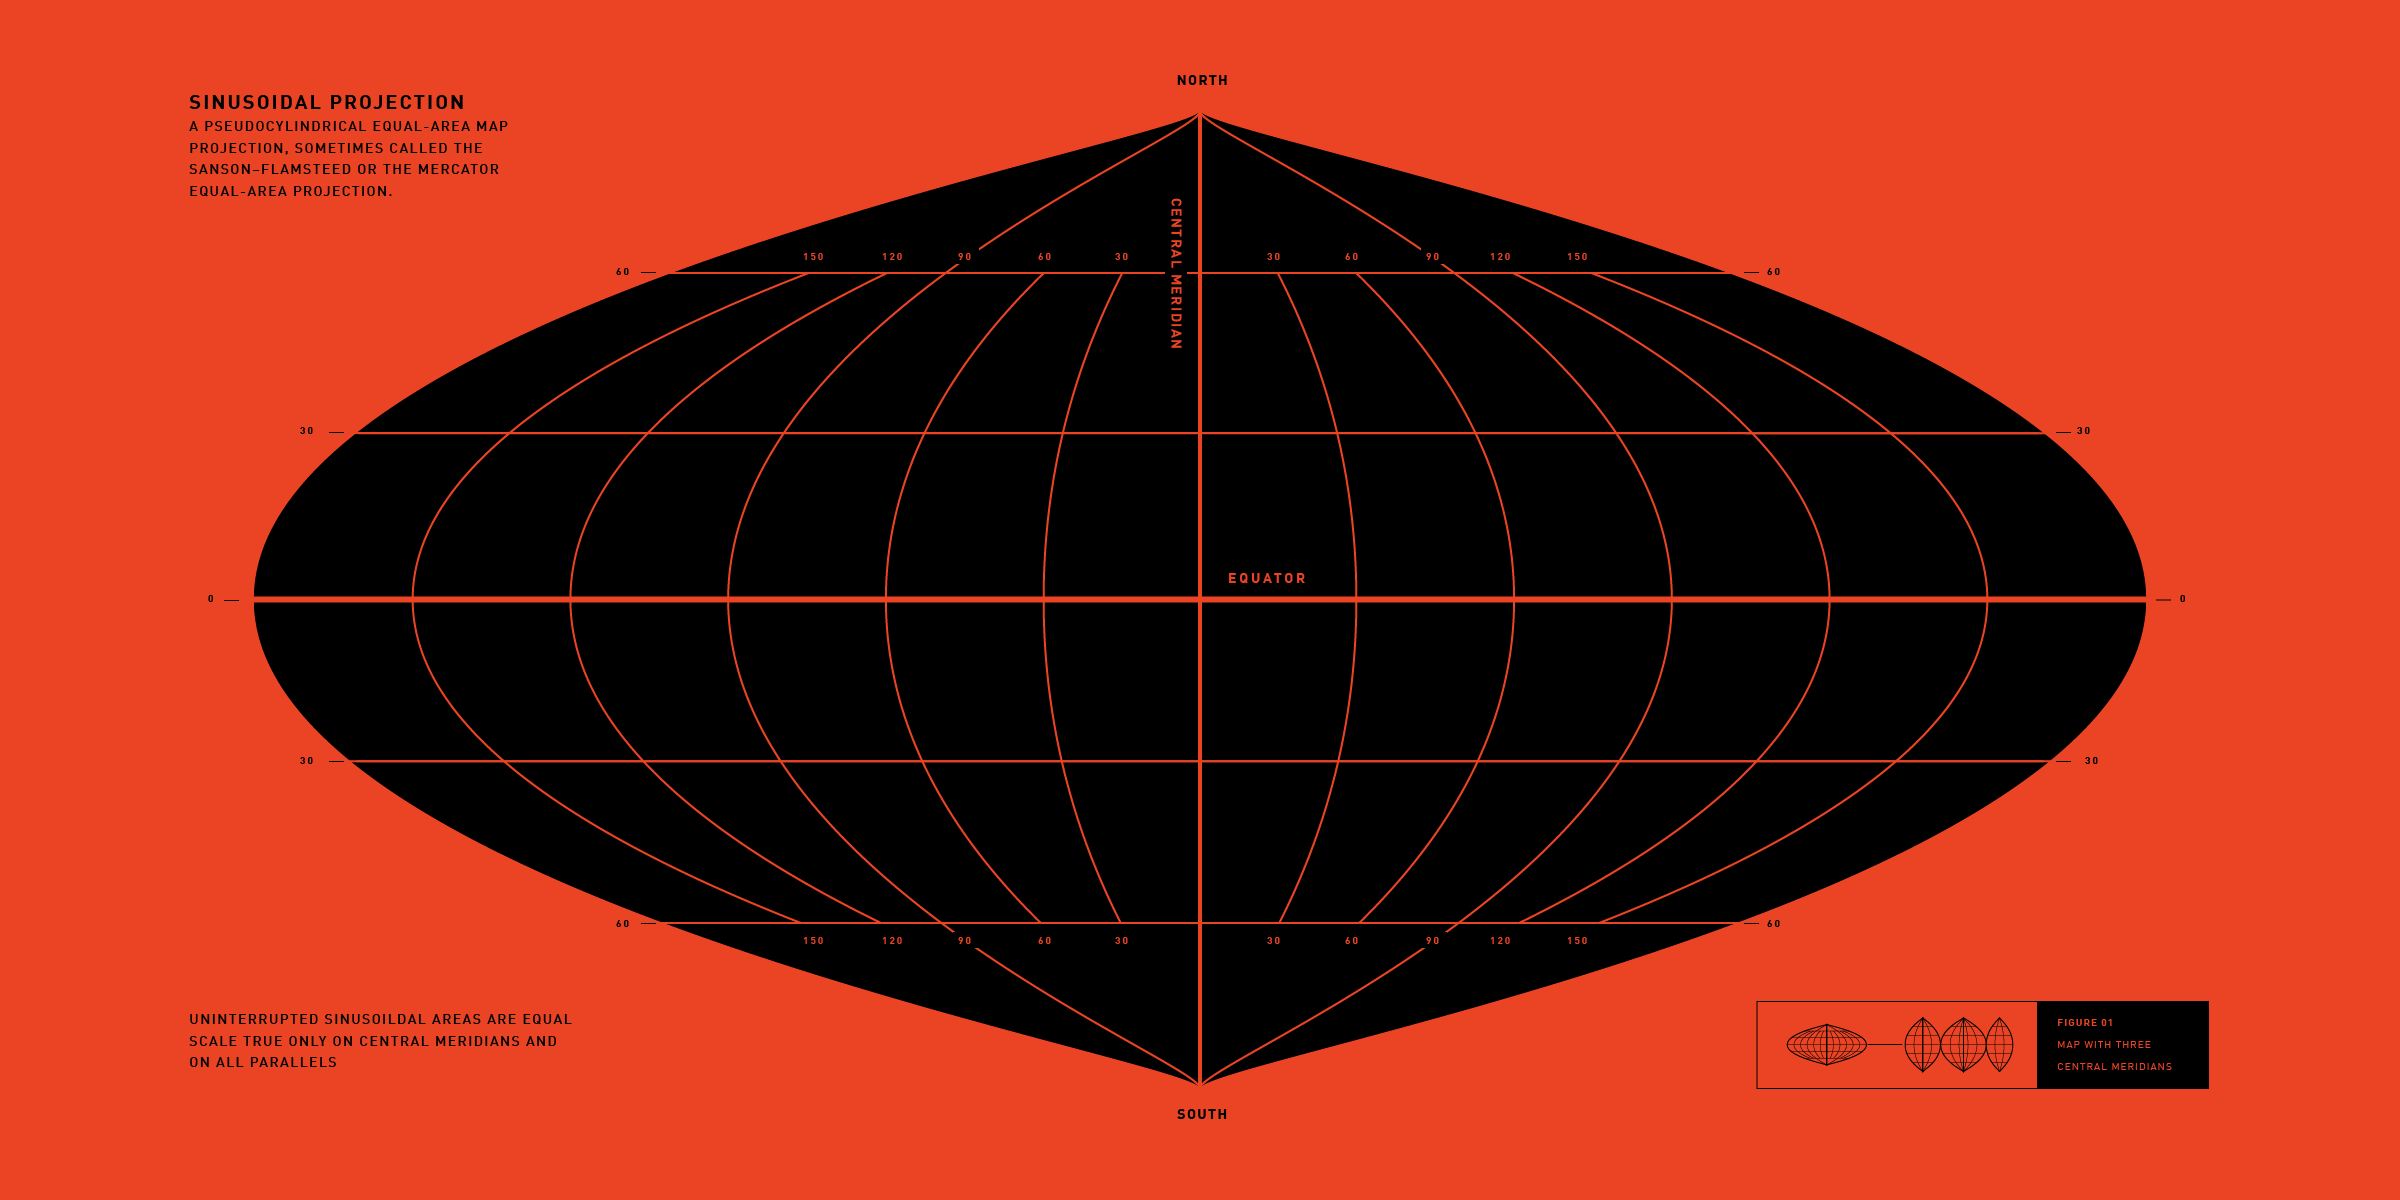 Sinusoidal globe projection